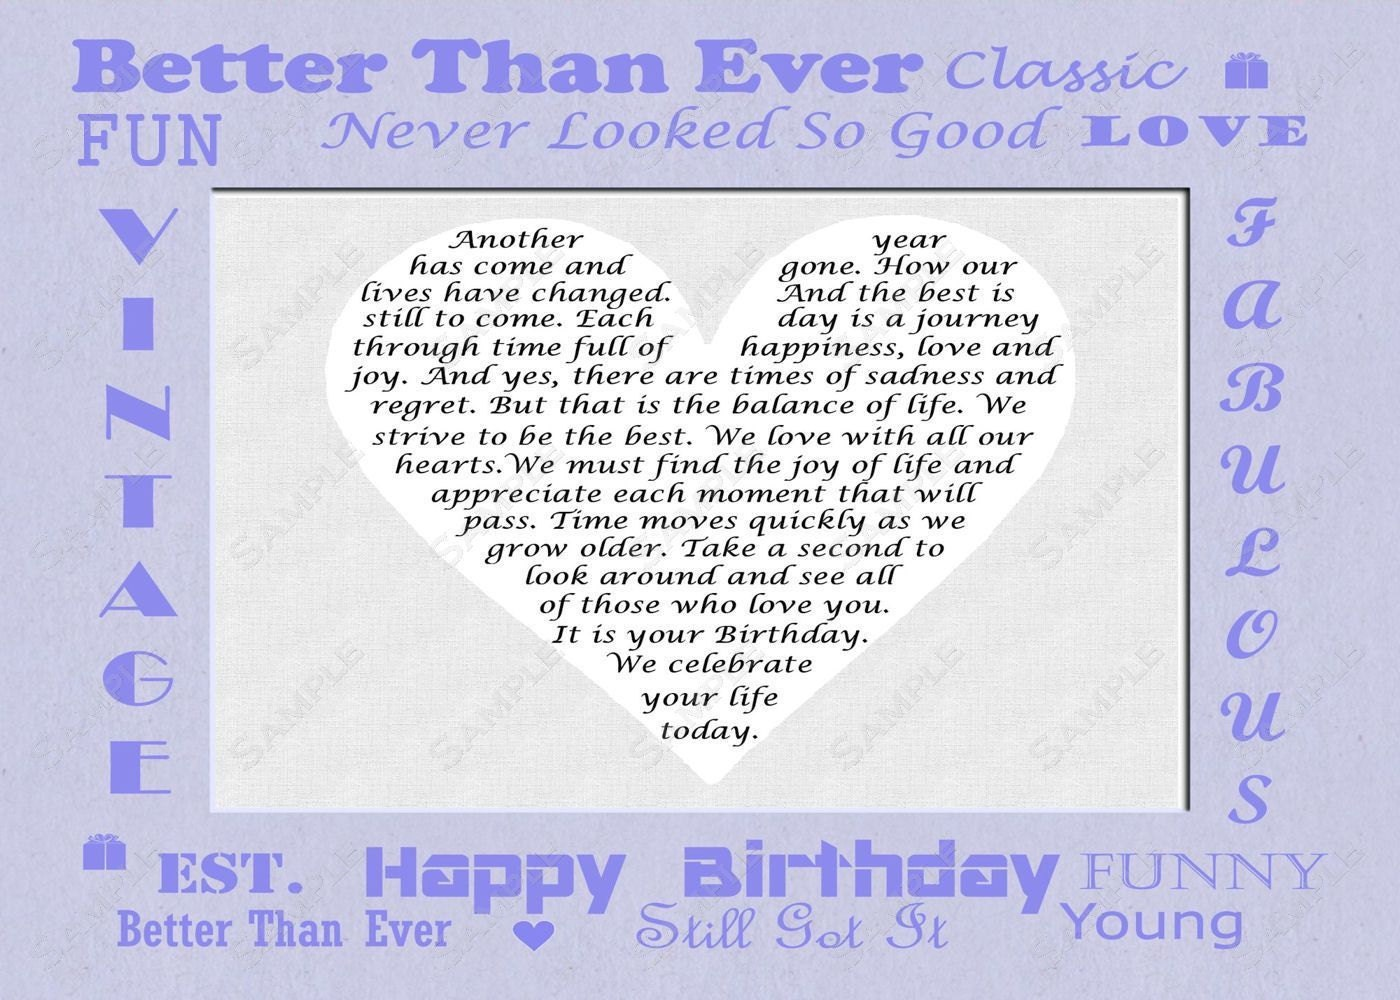 Eightieth Birthday Invitations as nice invitations design